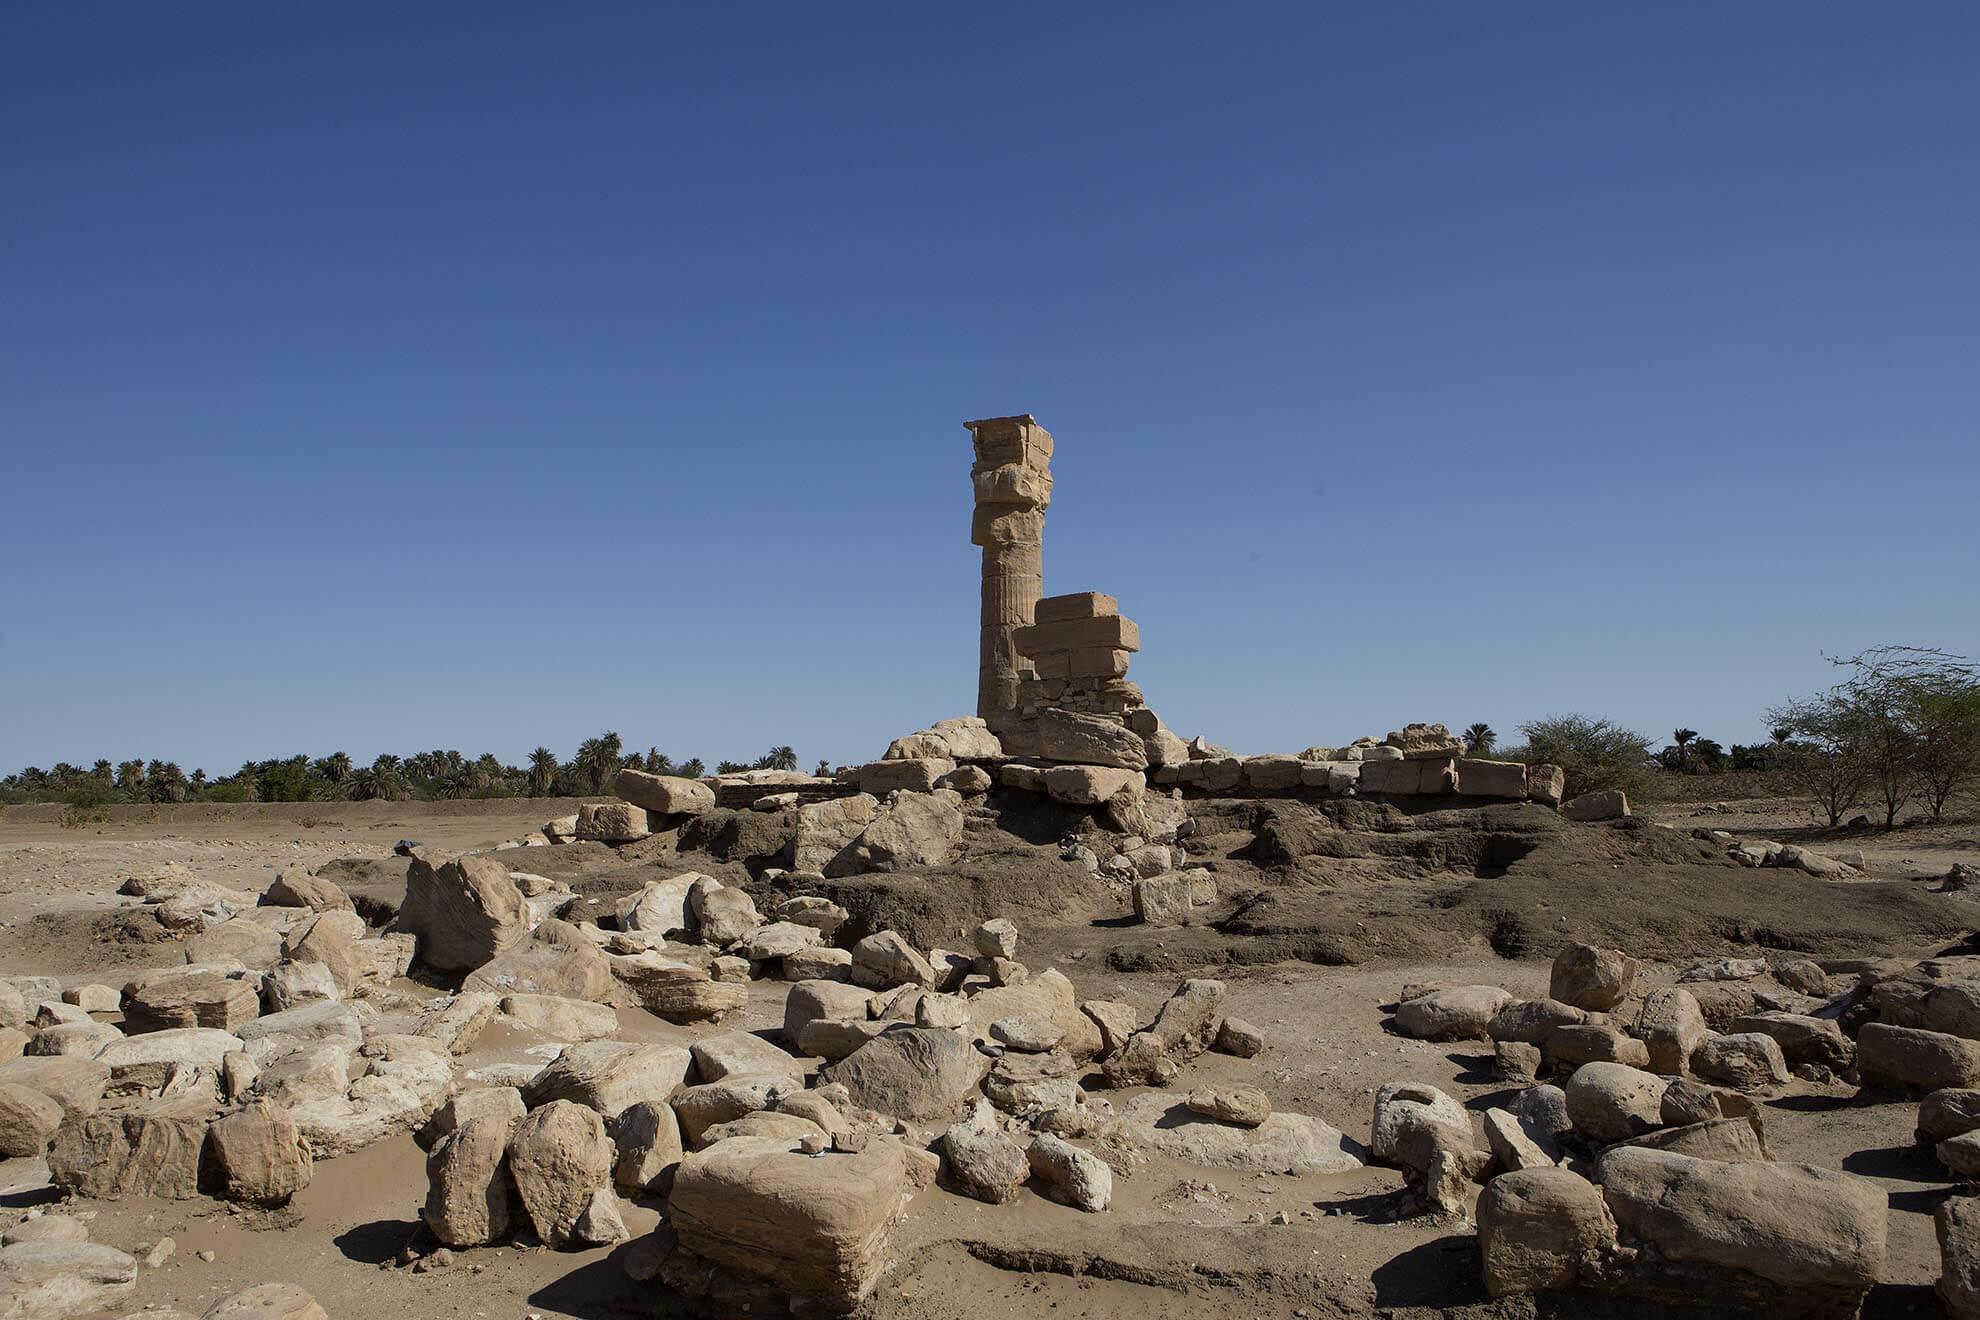 viajes a sudán